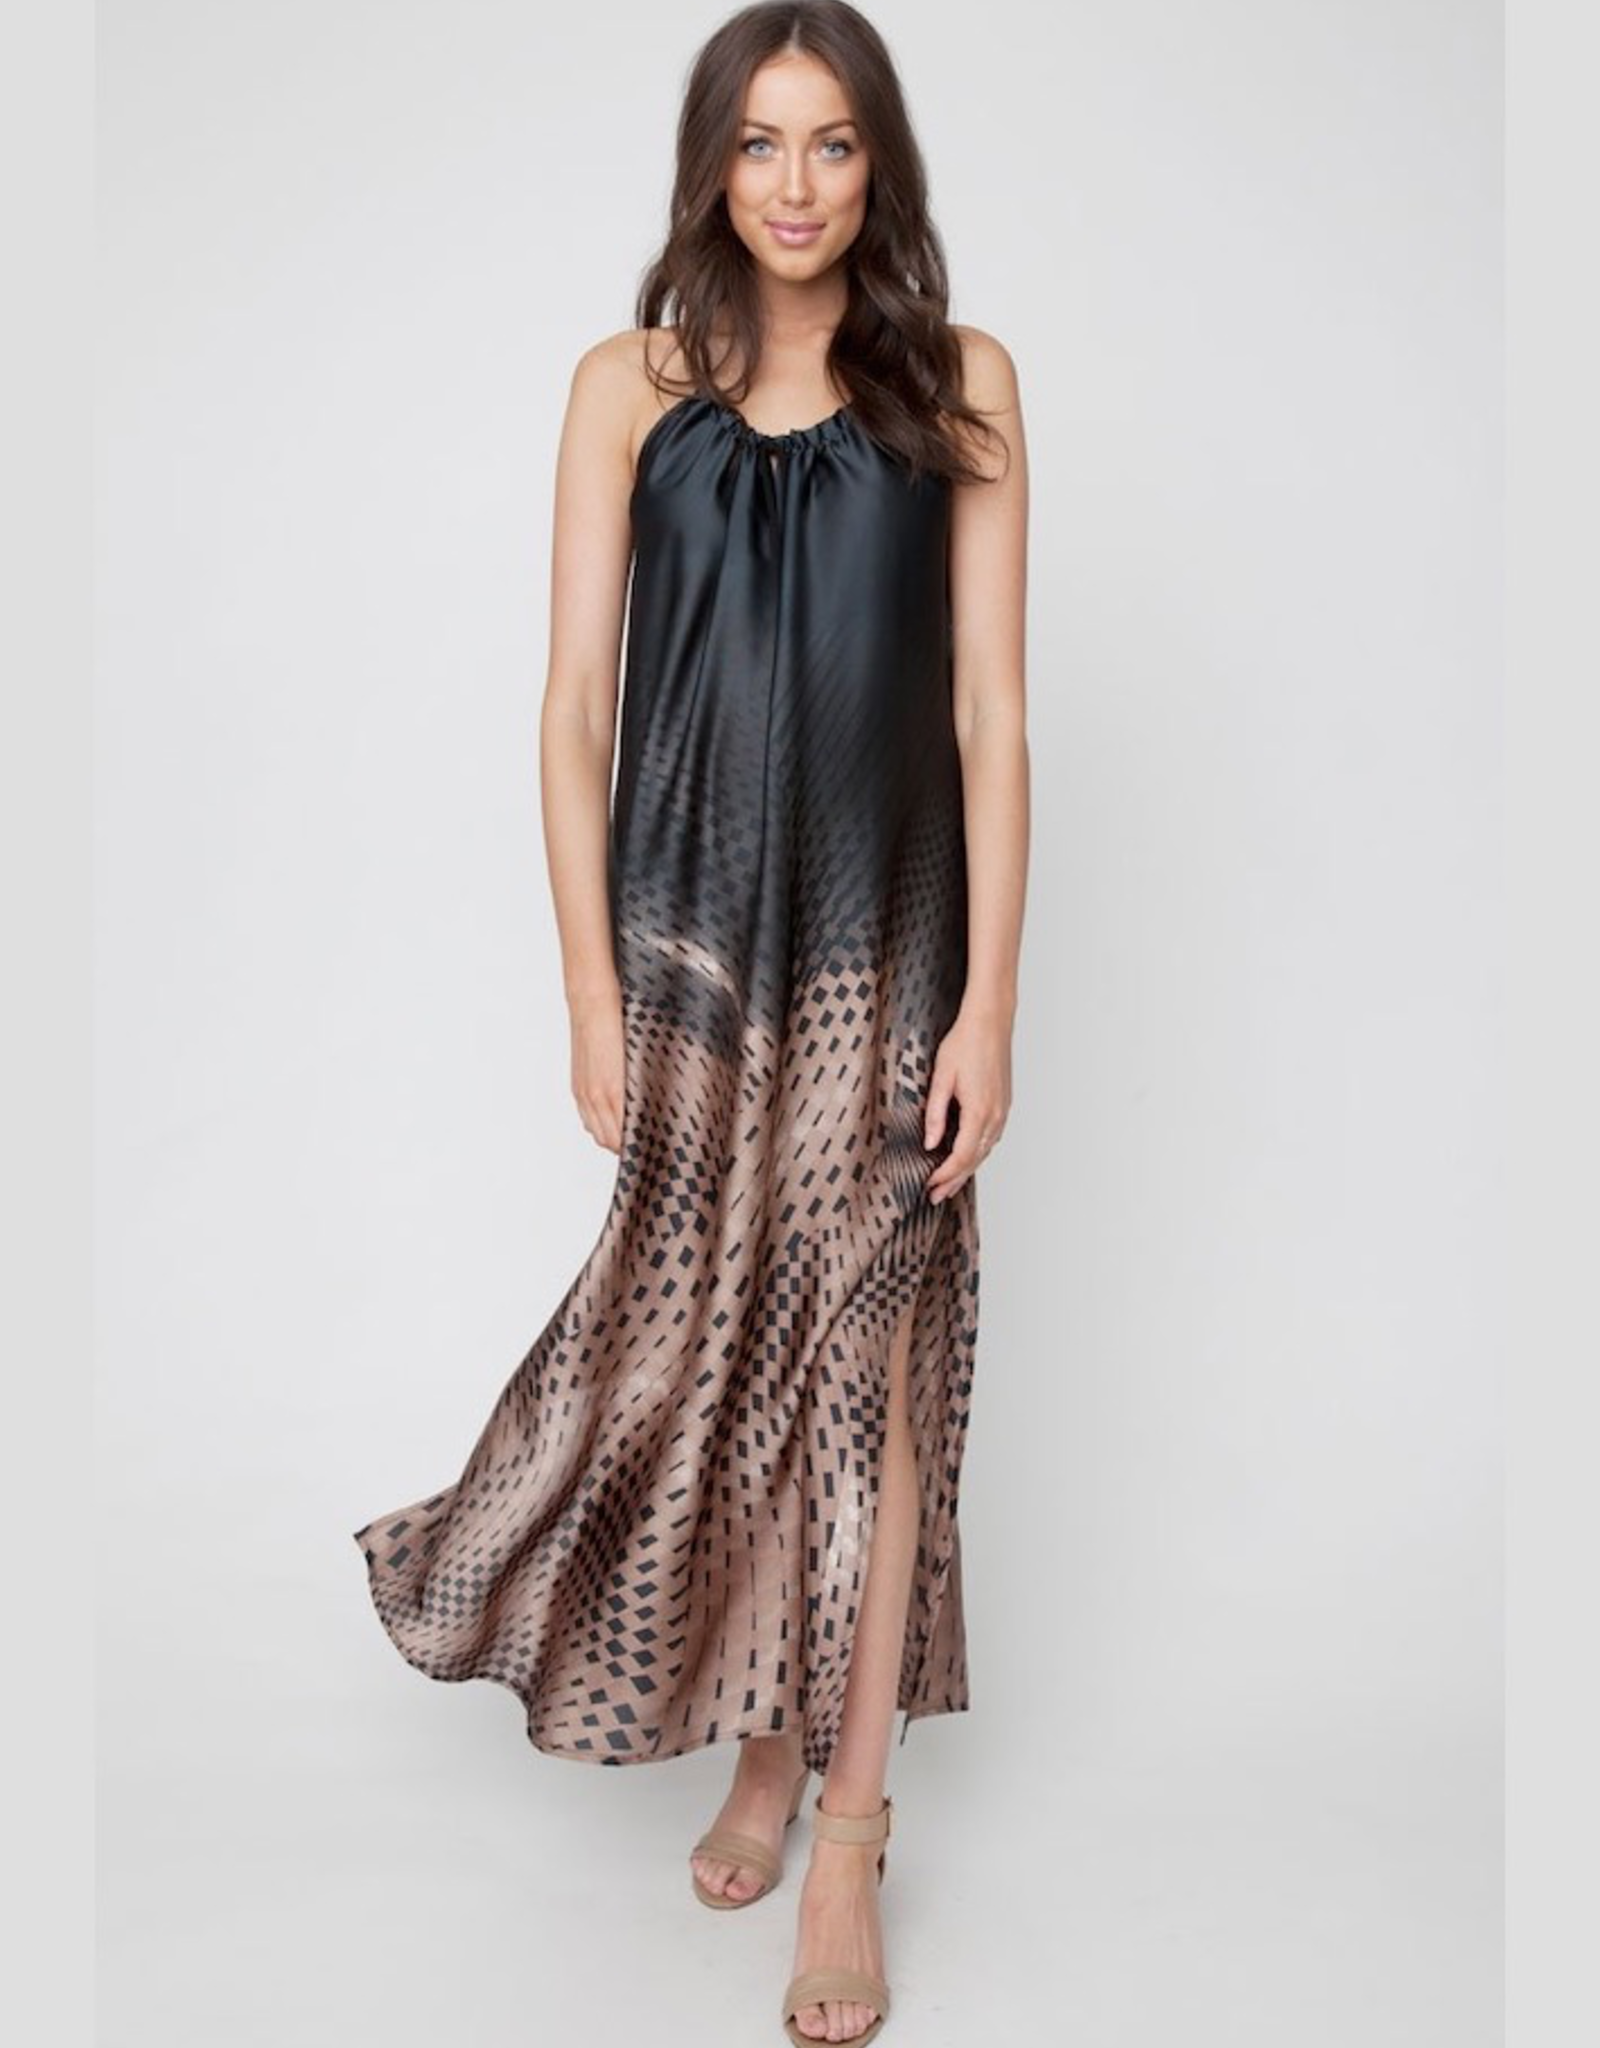 Ripe Maternity Goddess Maxi Dress